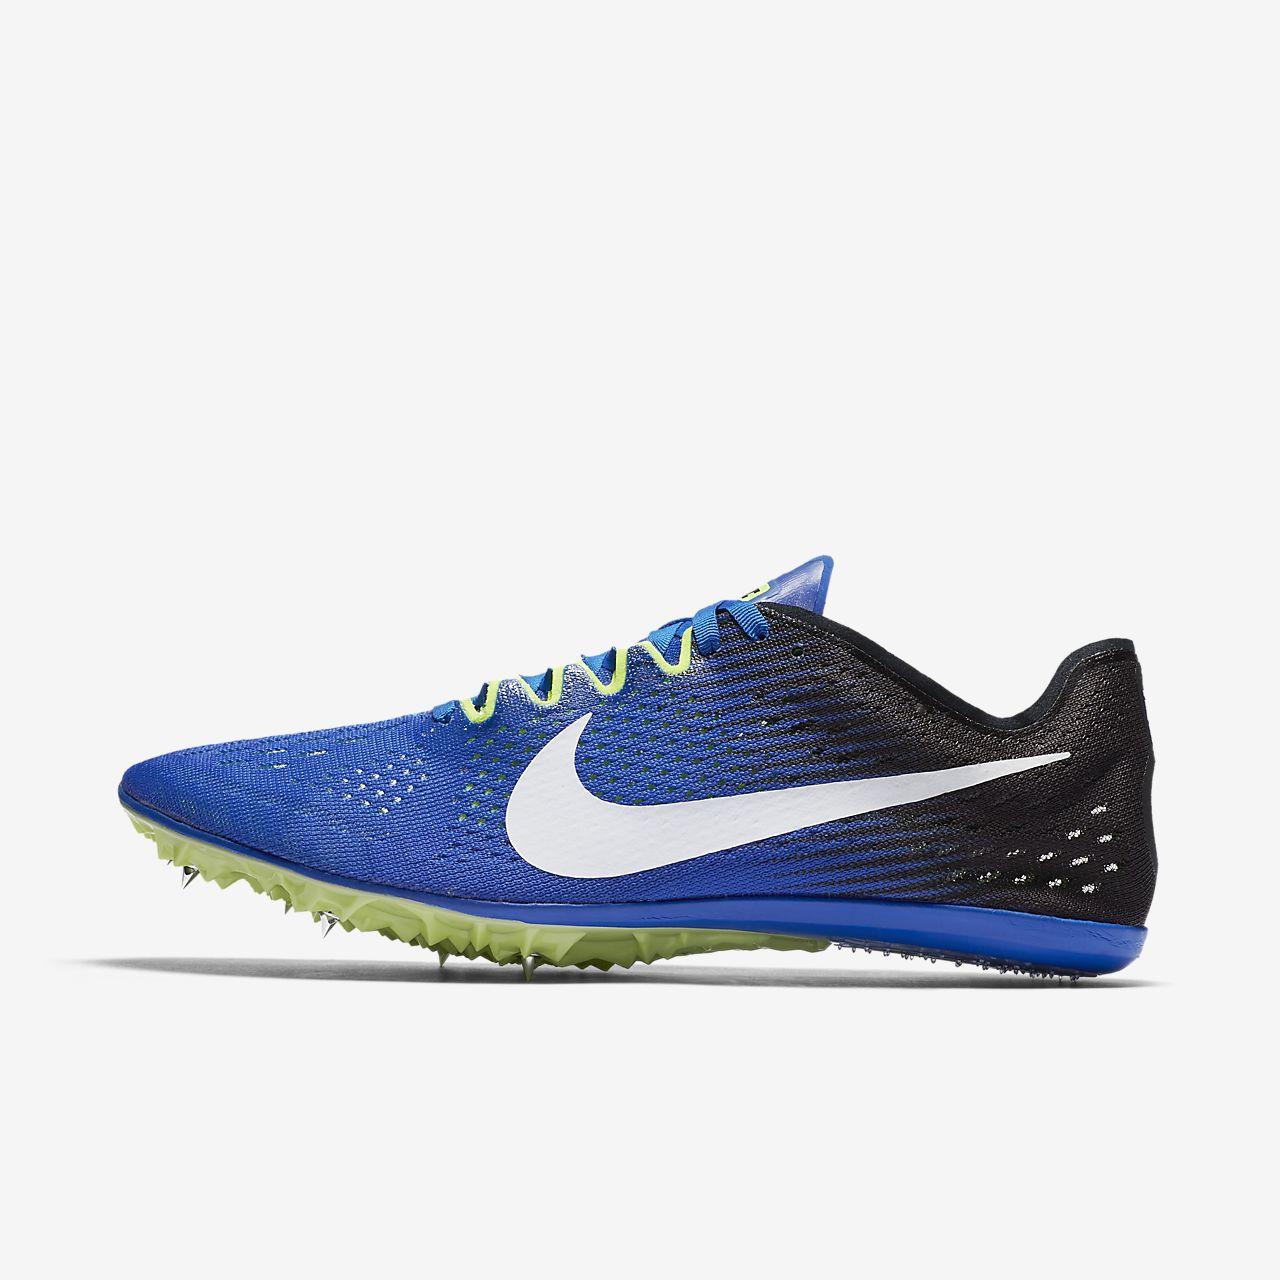 ... Nike Zoom Victory 3 Unisex Racing Spike